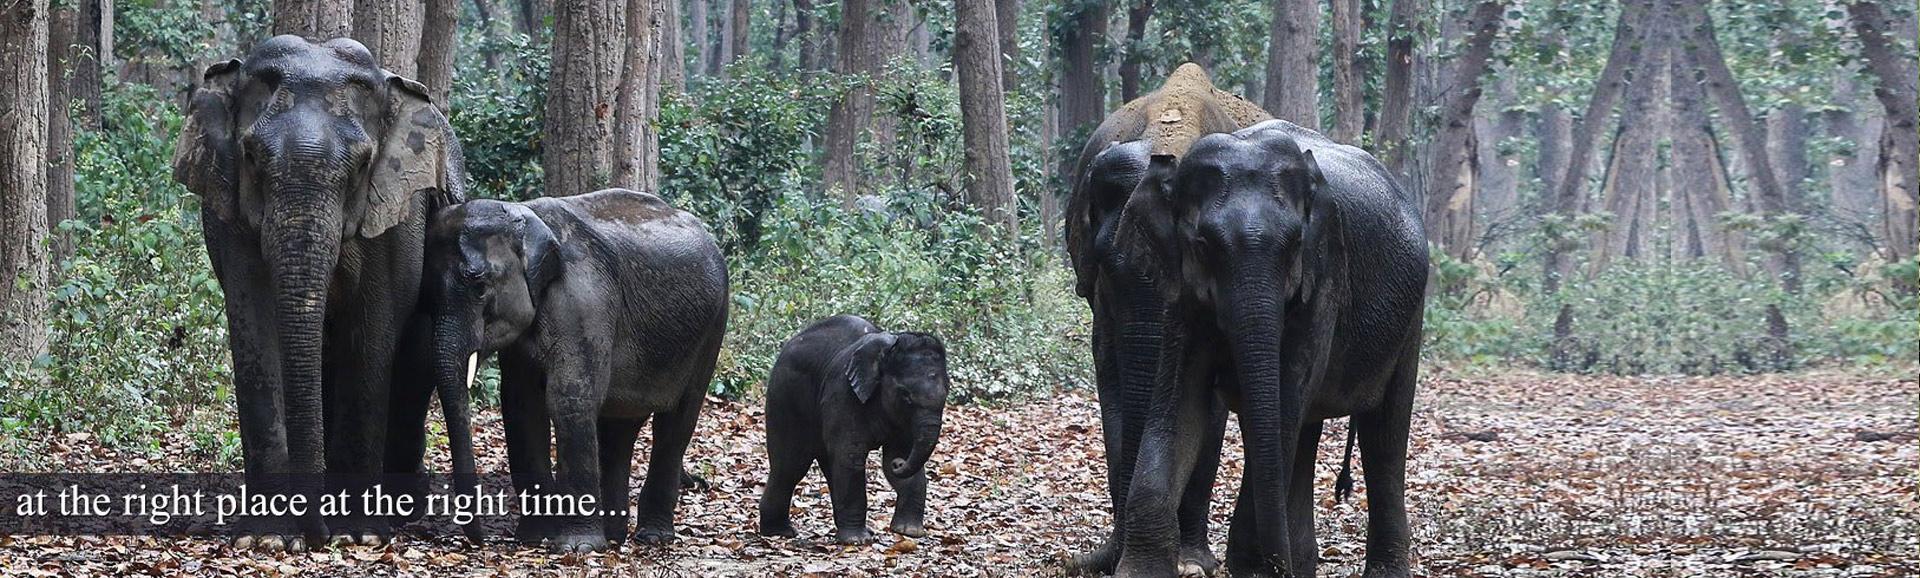 Corbett Elephant Safari